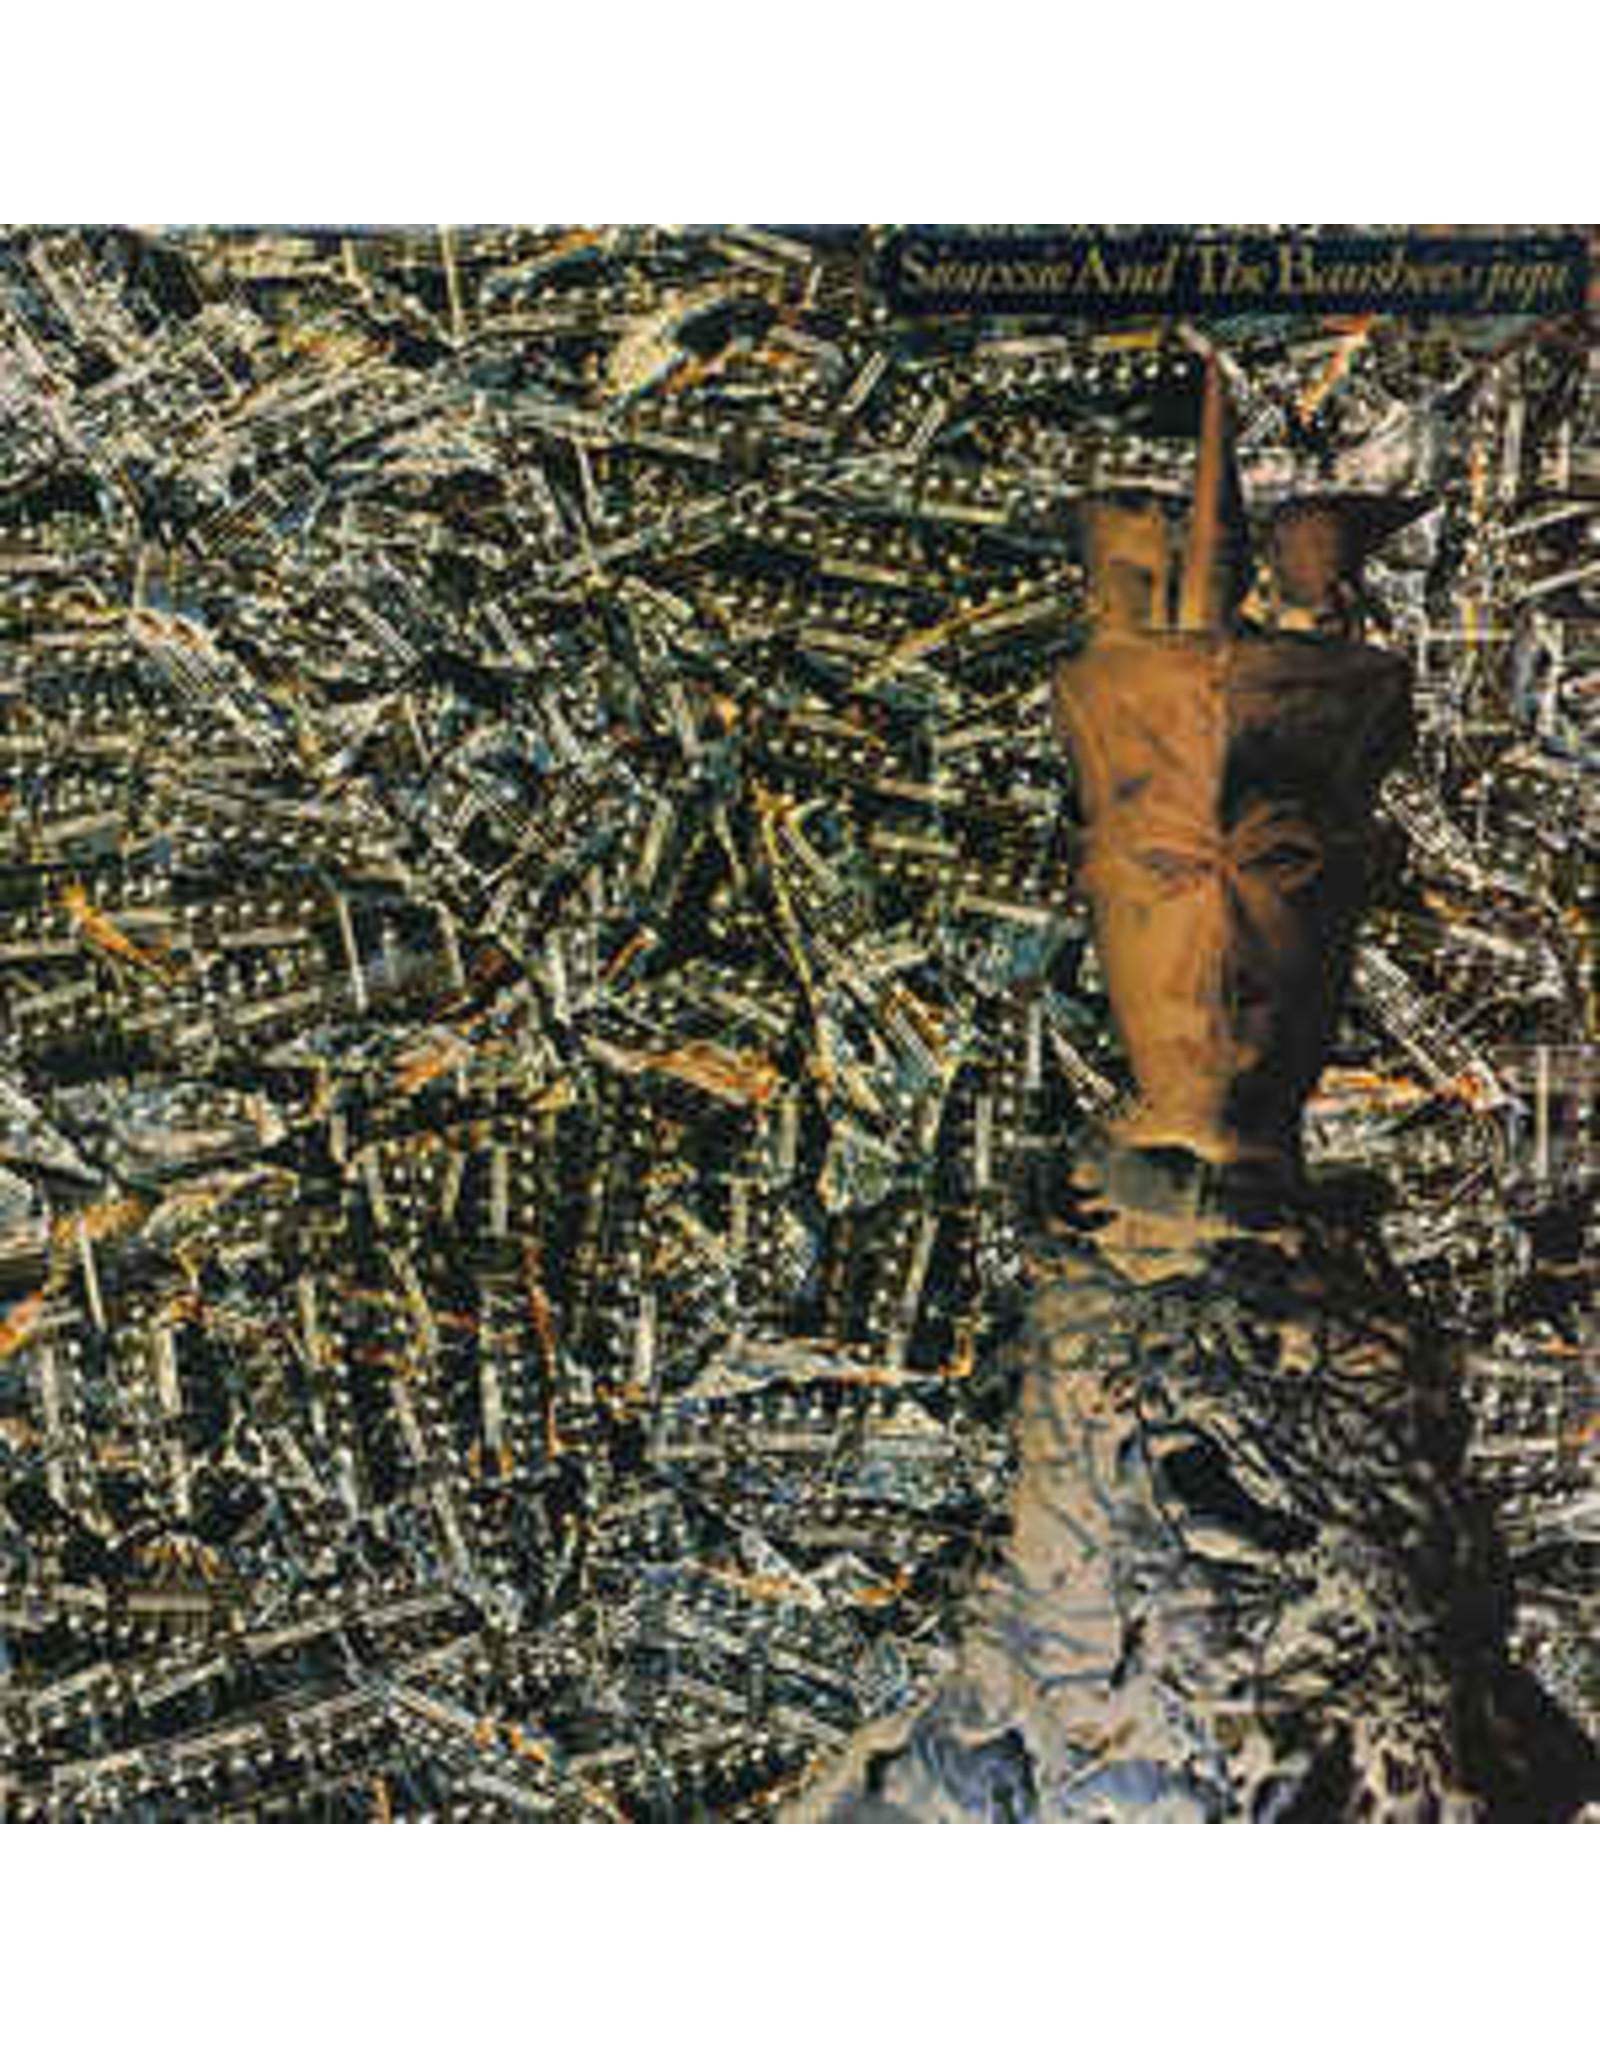 New Vinyl Siouxsie & The Banshees - Juju LP